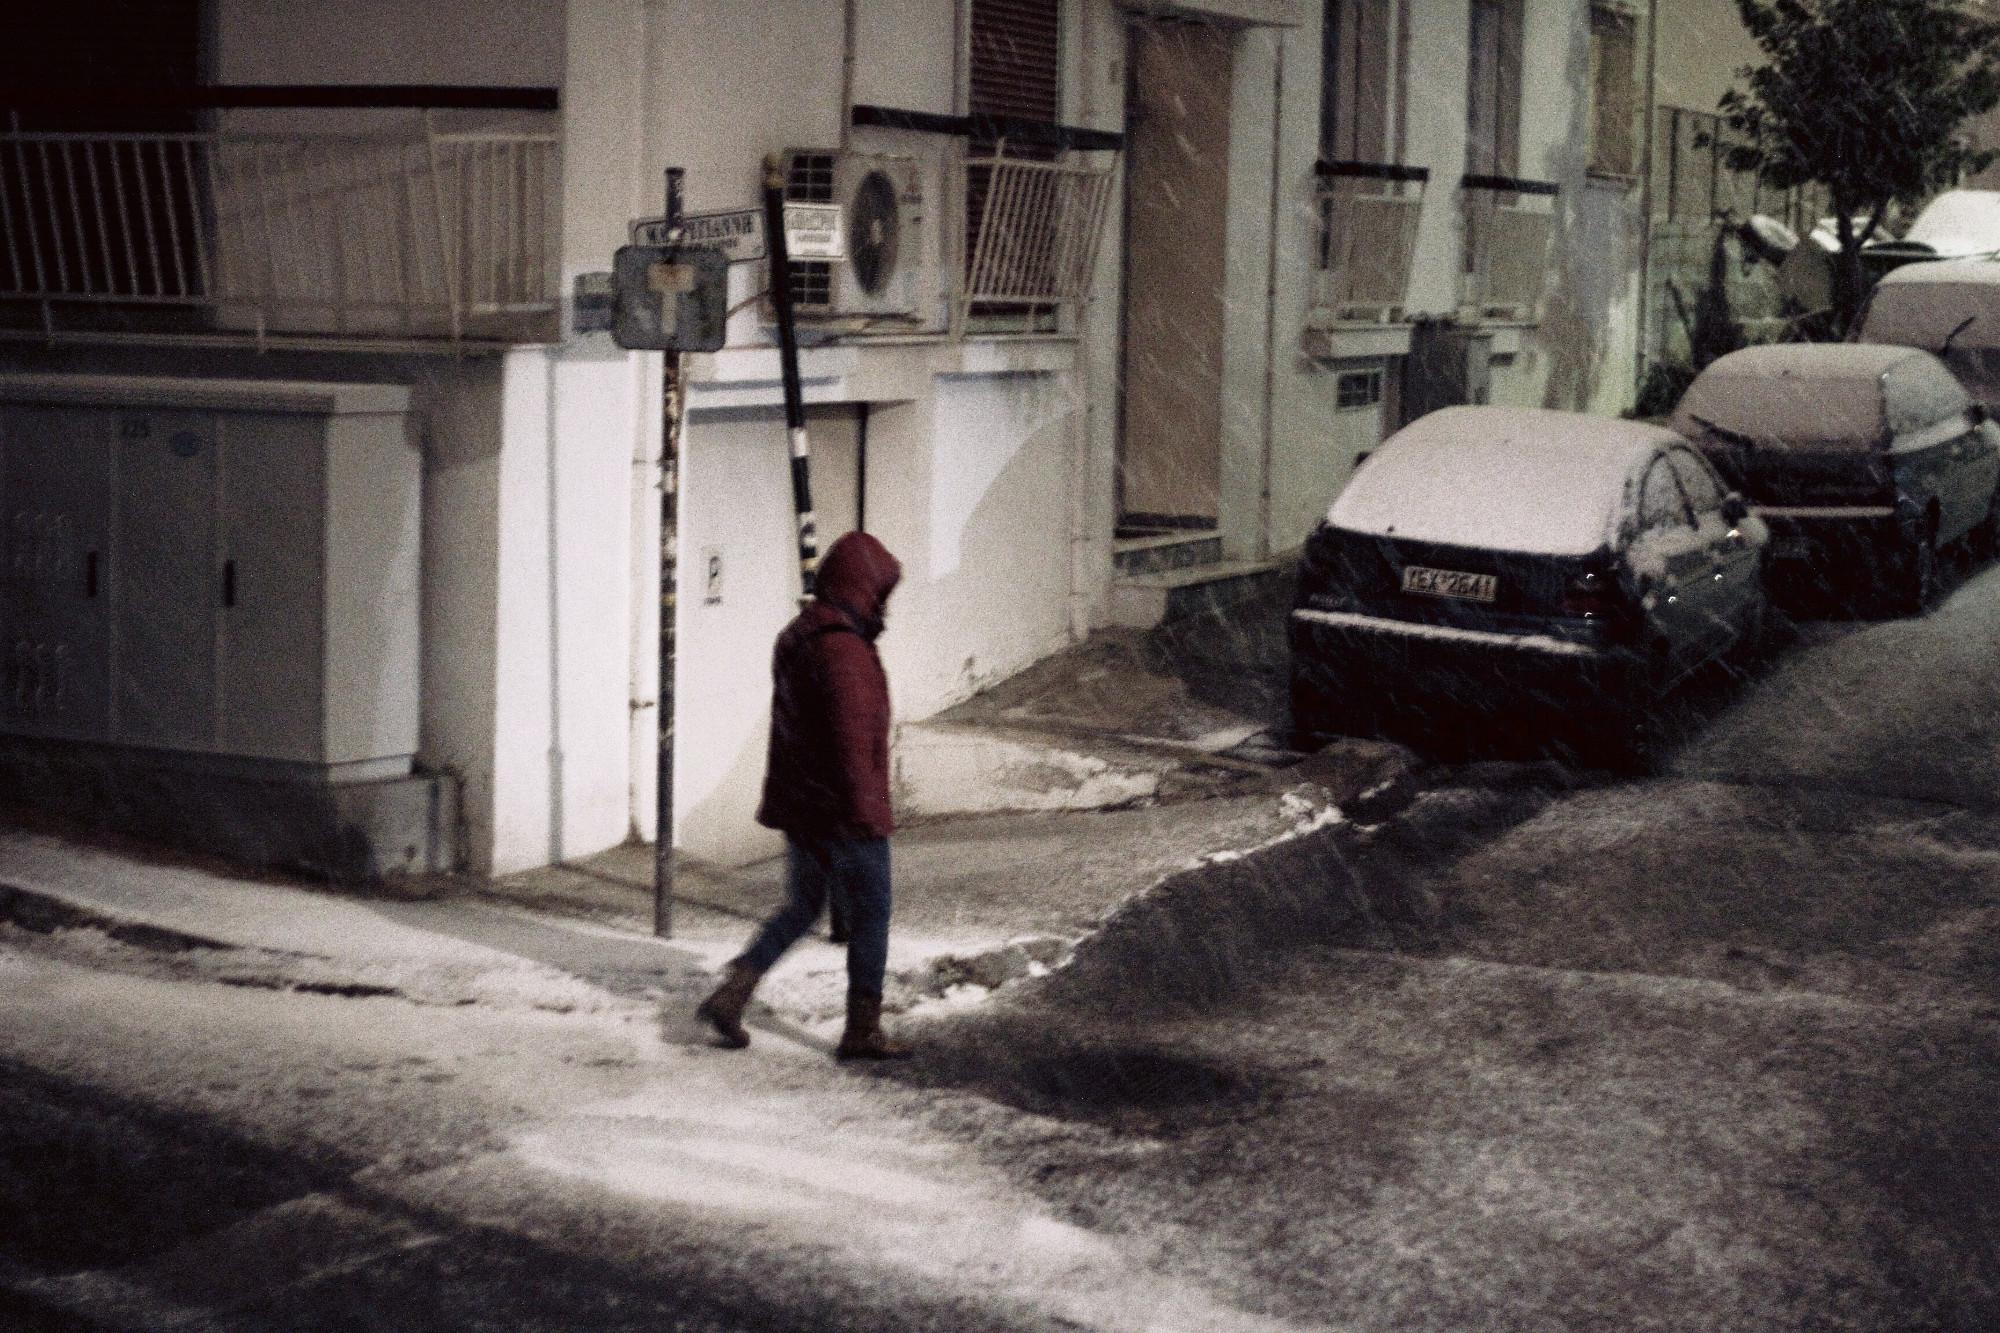 xionia-ilioupoli-1300 Στα «λευκά» ντύθηκε η Αθήνα – Συνεχίζεται και την Τρίτη η σφοδρή κακοκαιρία [εικόνες]